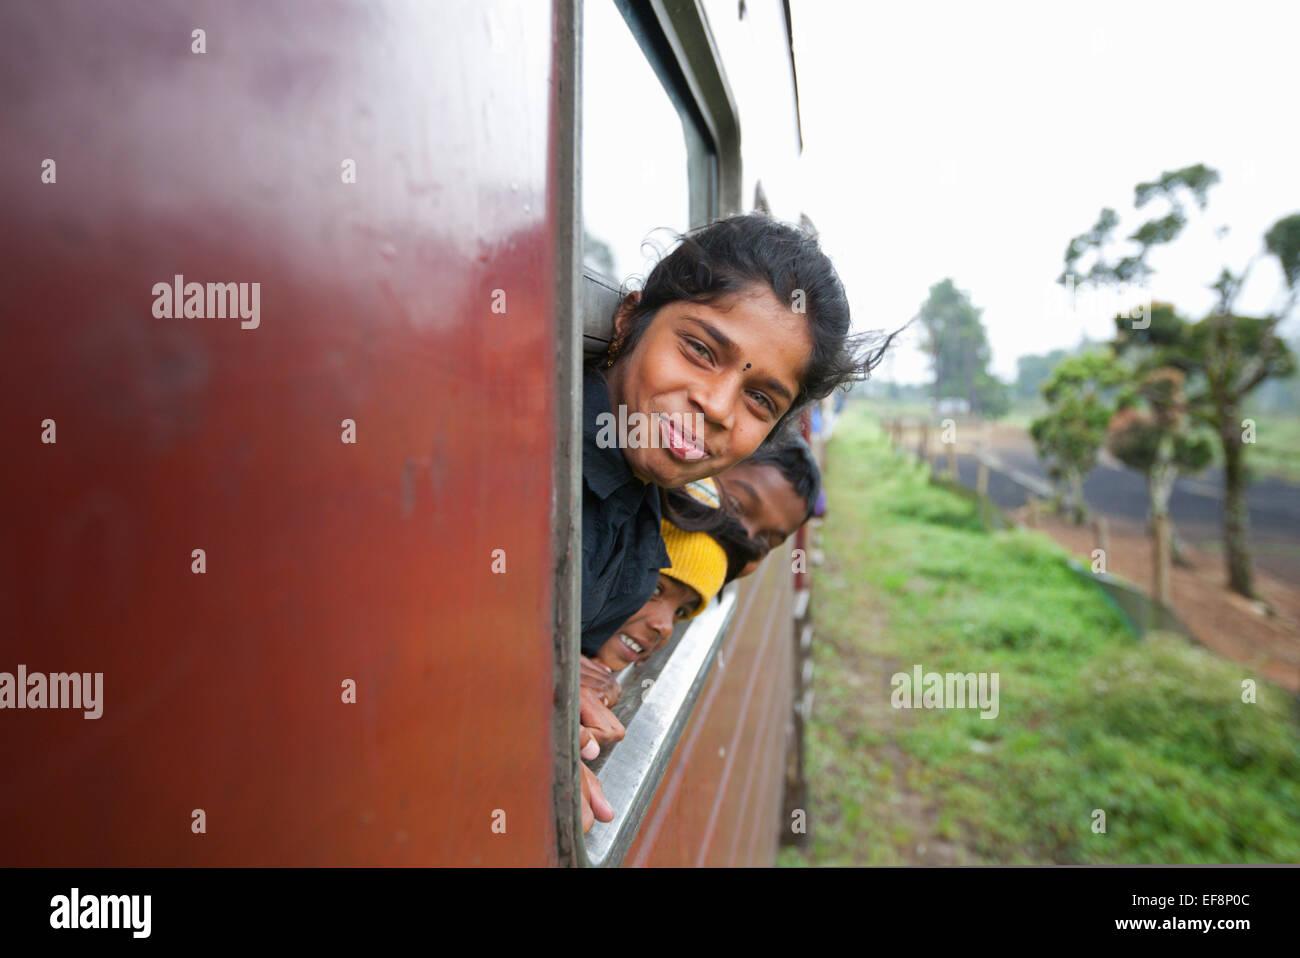 sri lankan girl stock photos & sri lankan girl stock images - alamy